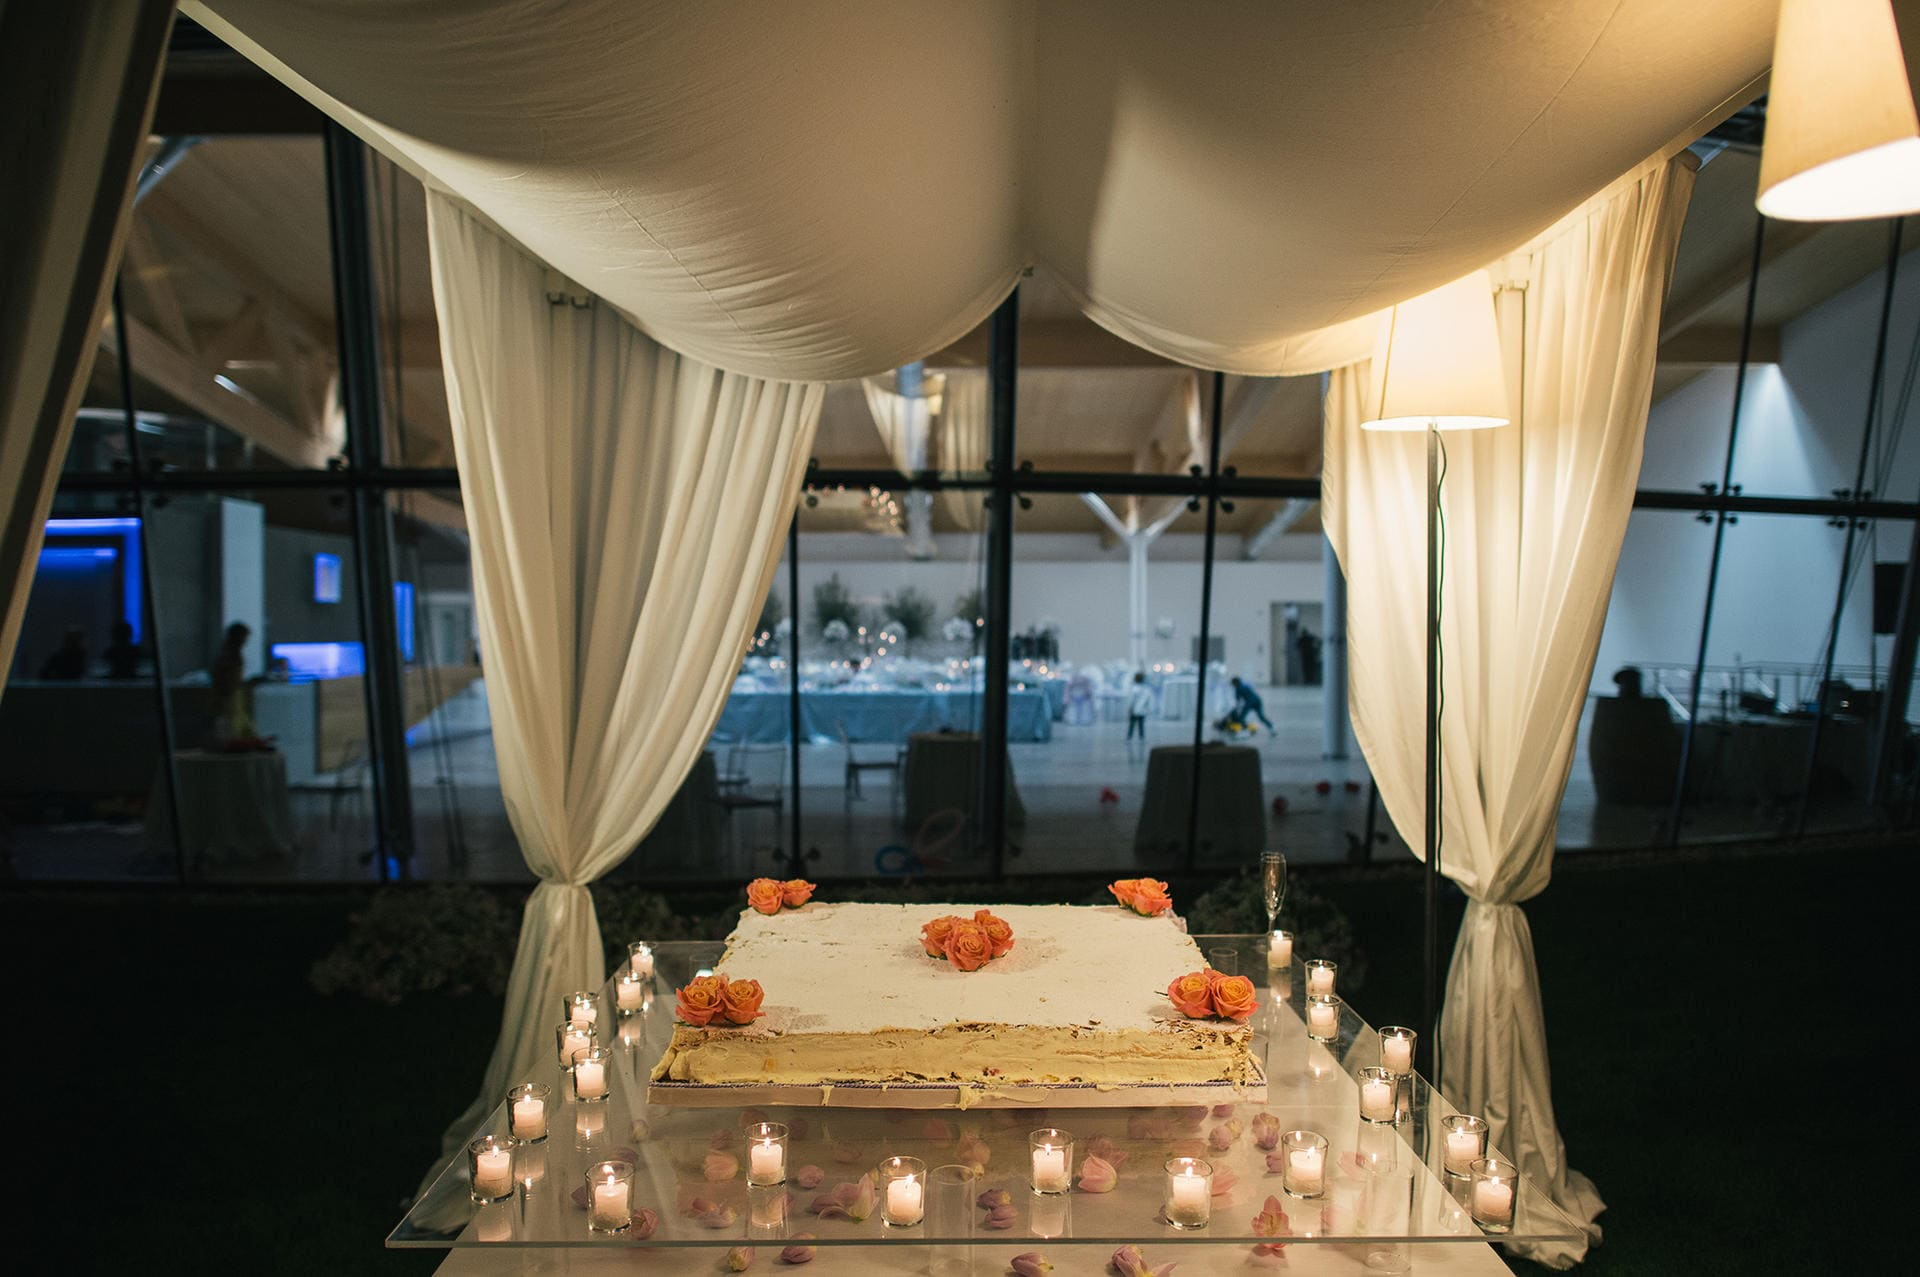 10.05.2014 - Wedding Cake